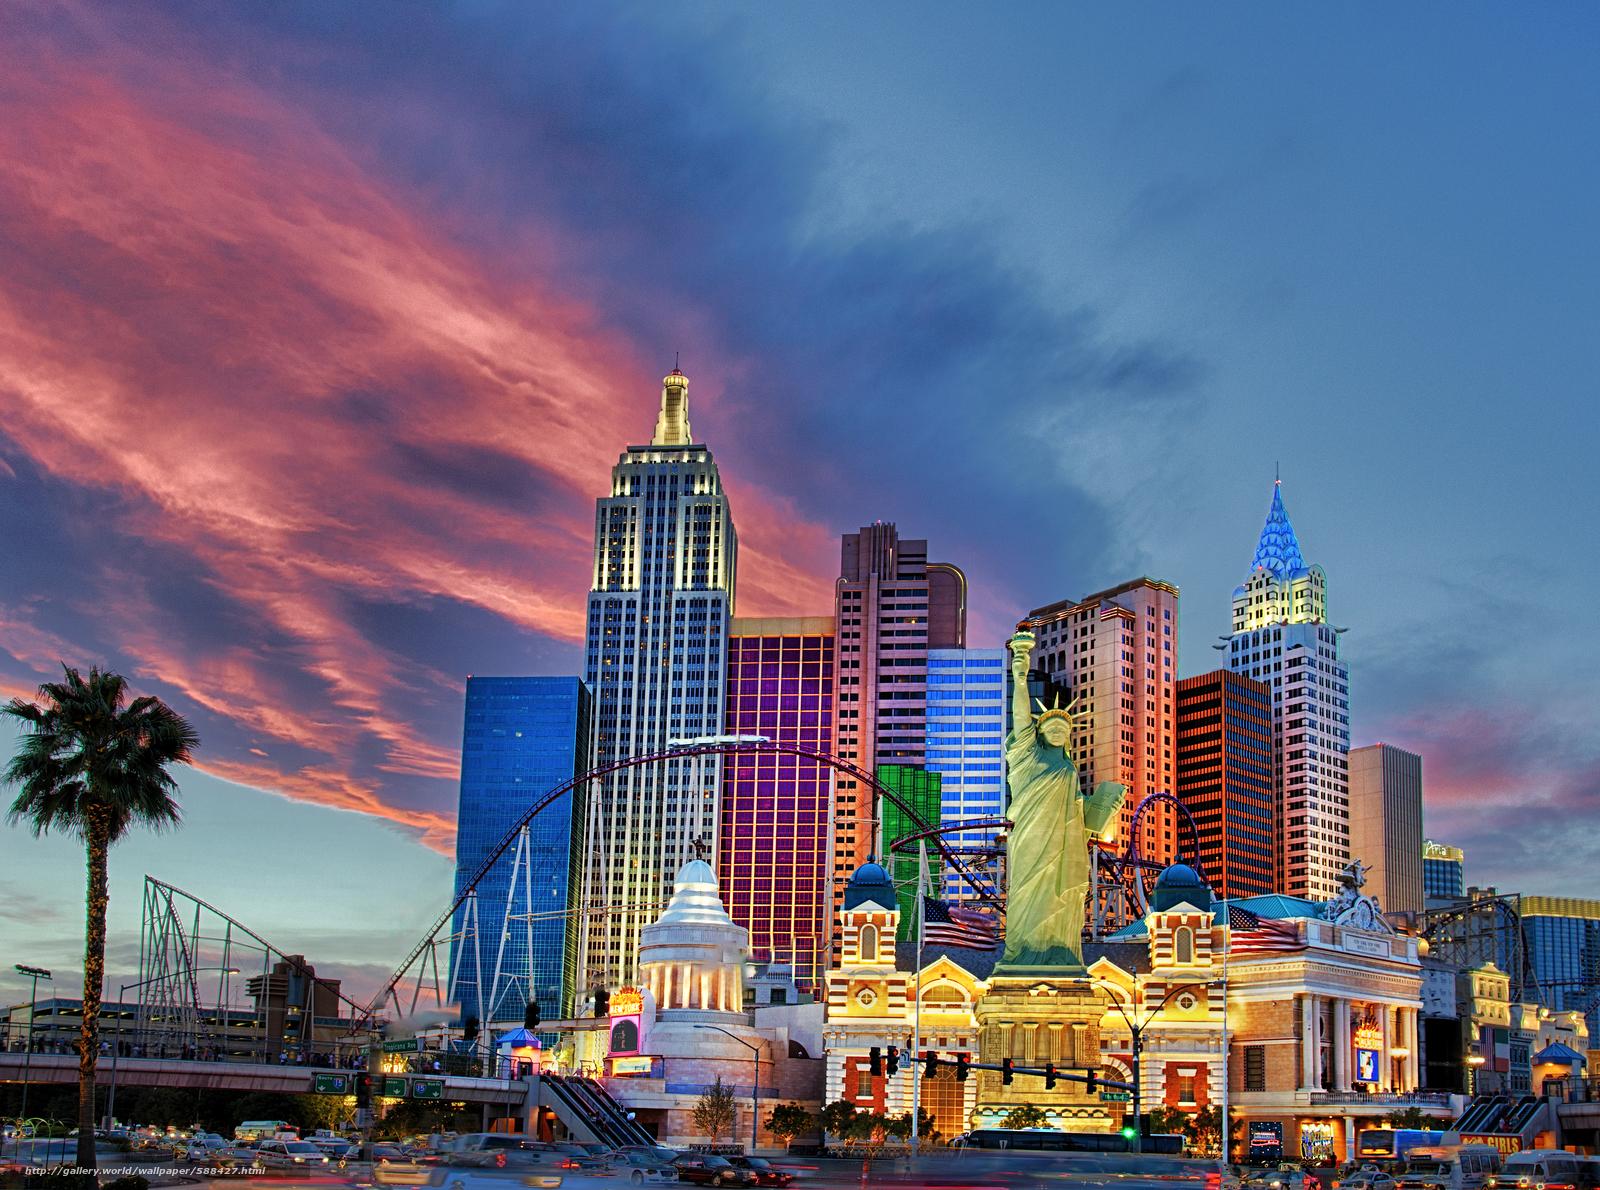 Download Wallpaper Las Vegas City Sunset Free Desktop Wallpaper In The Resolution 6168x4588 Picture 588427